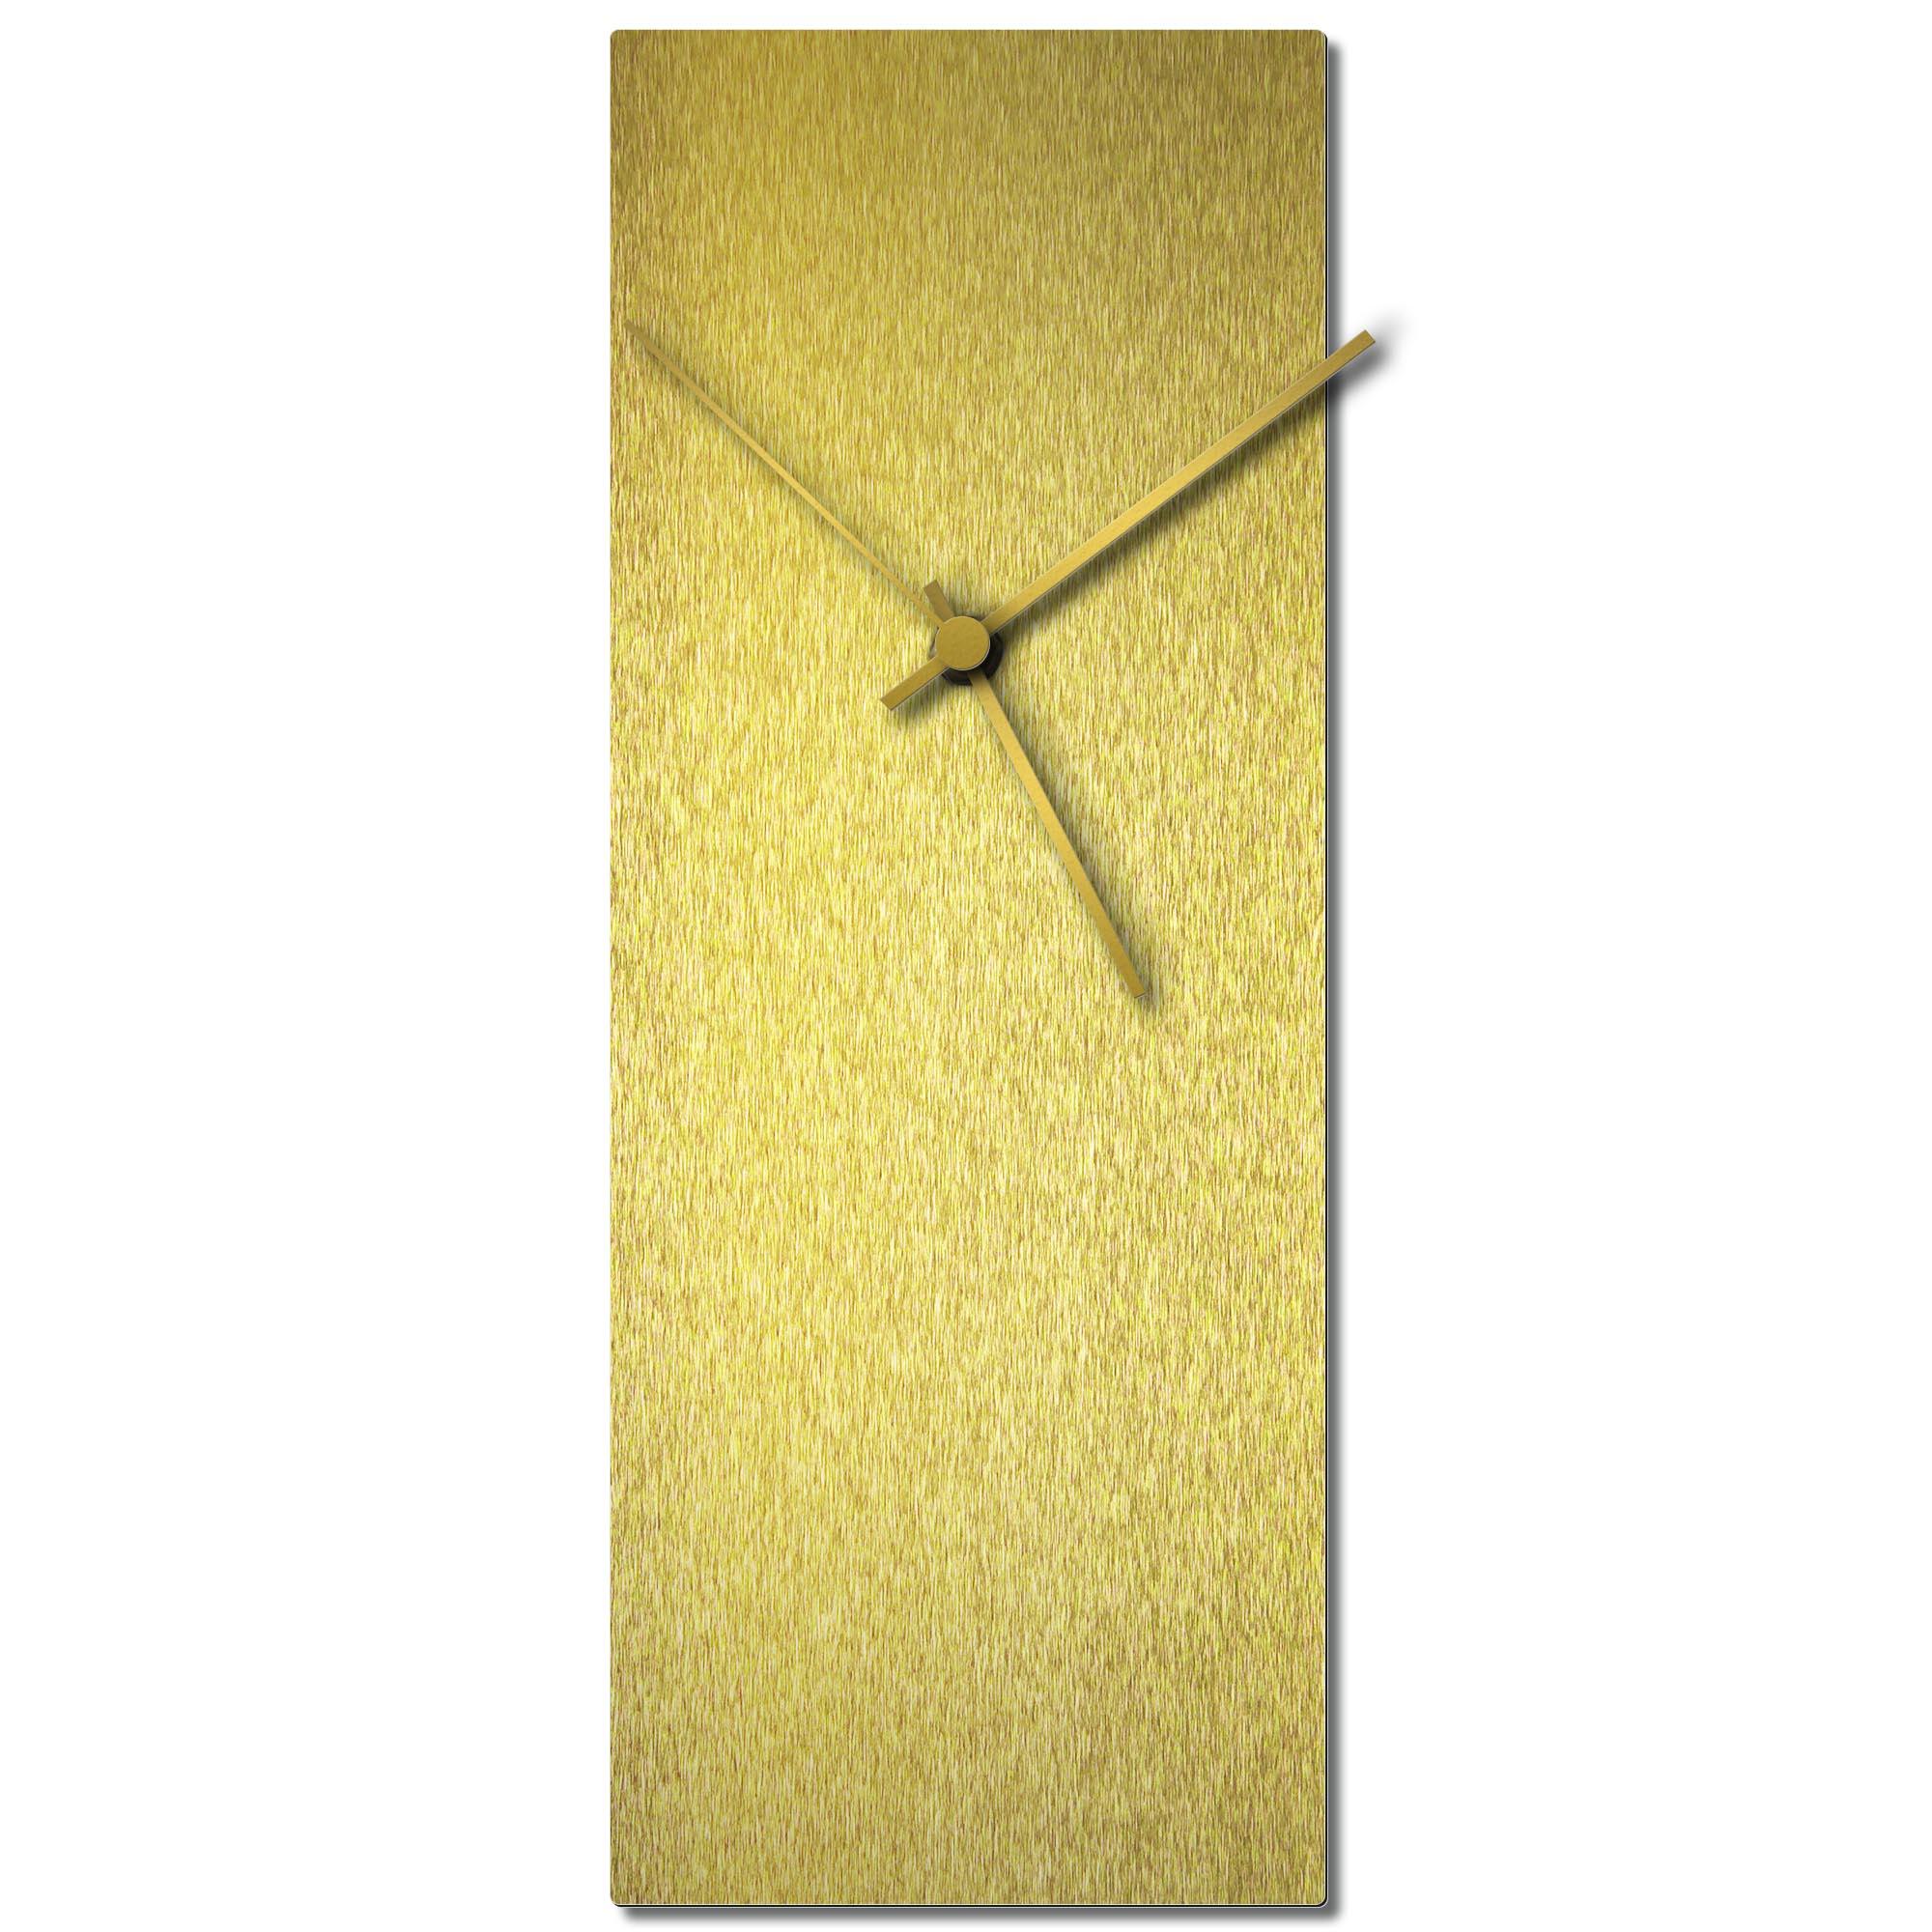 Adam Schwoeppe 'Goldsmith Clock Large Gold' Midcentury Modern Style Wall Clock